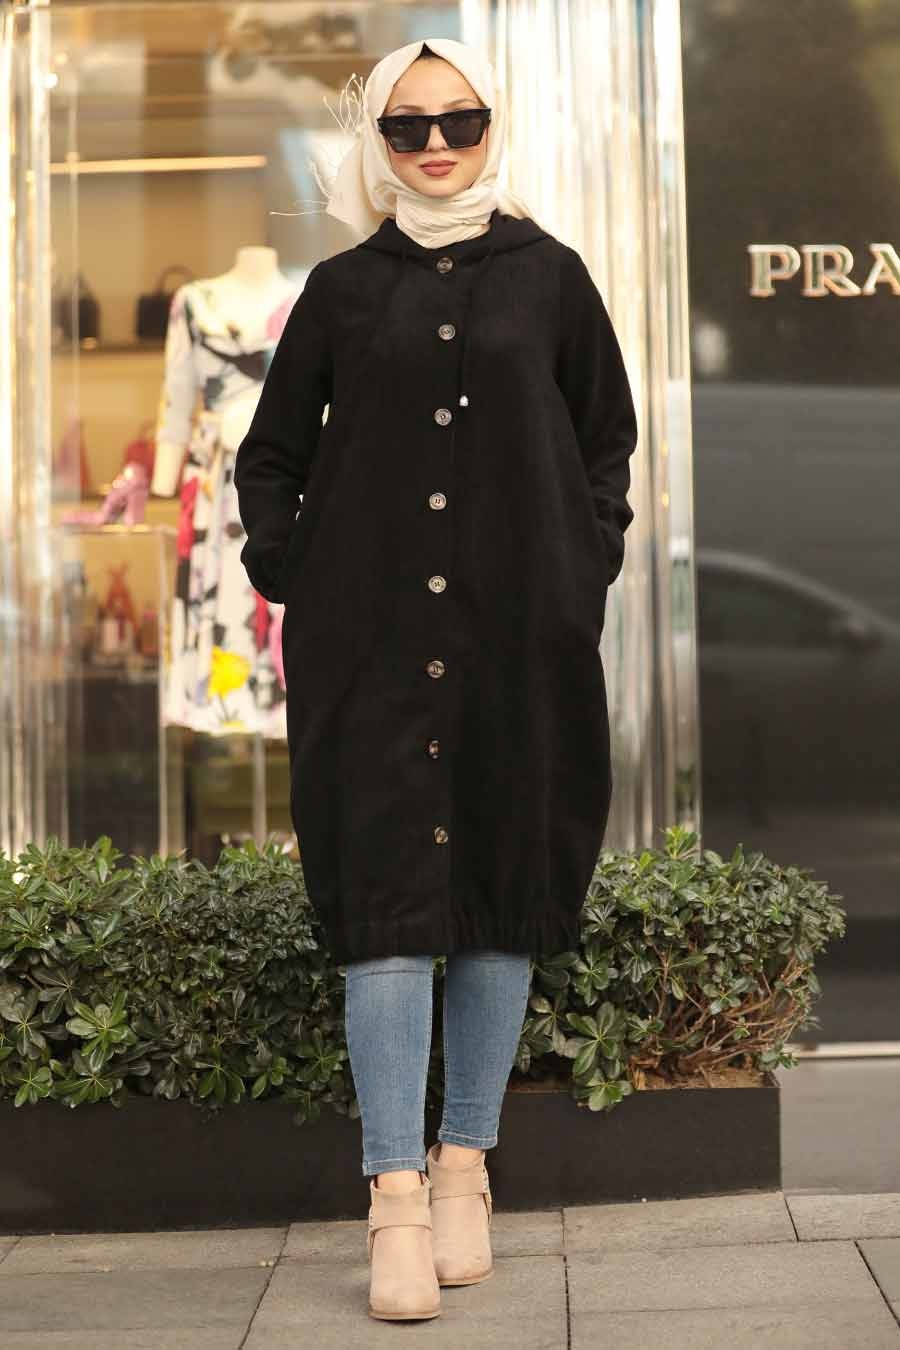 Neva Style - Black Hijab Coat 9042S